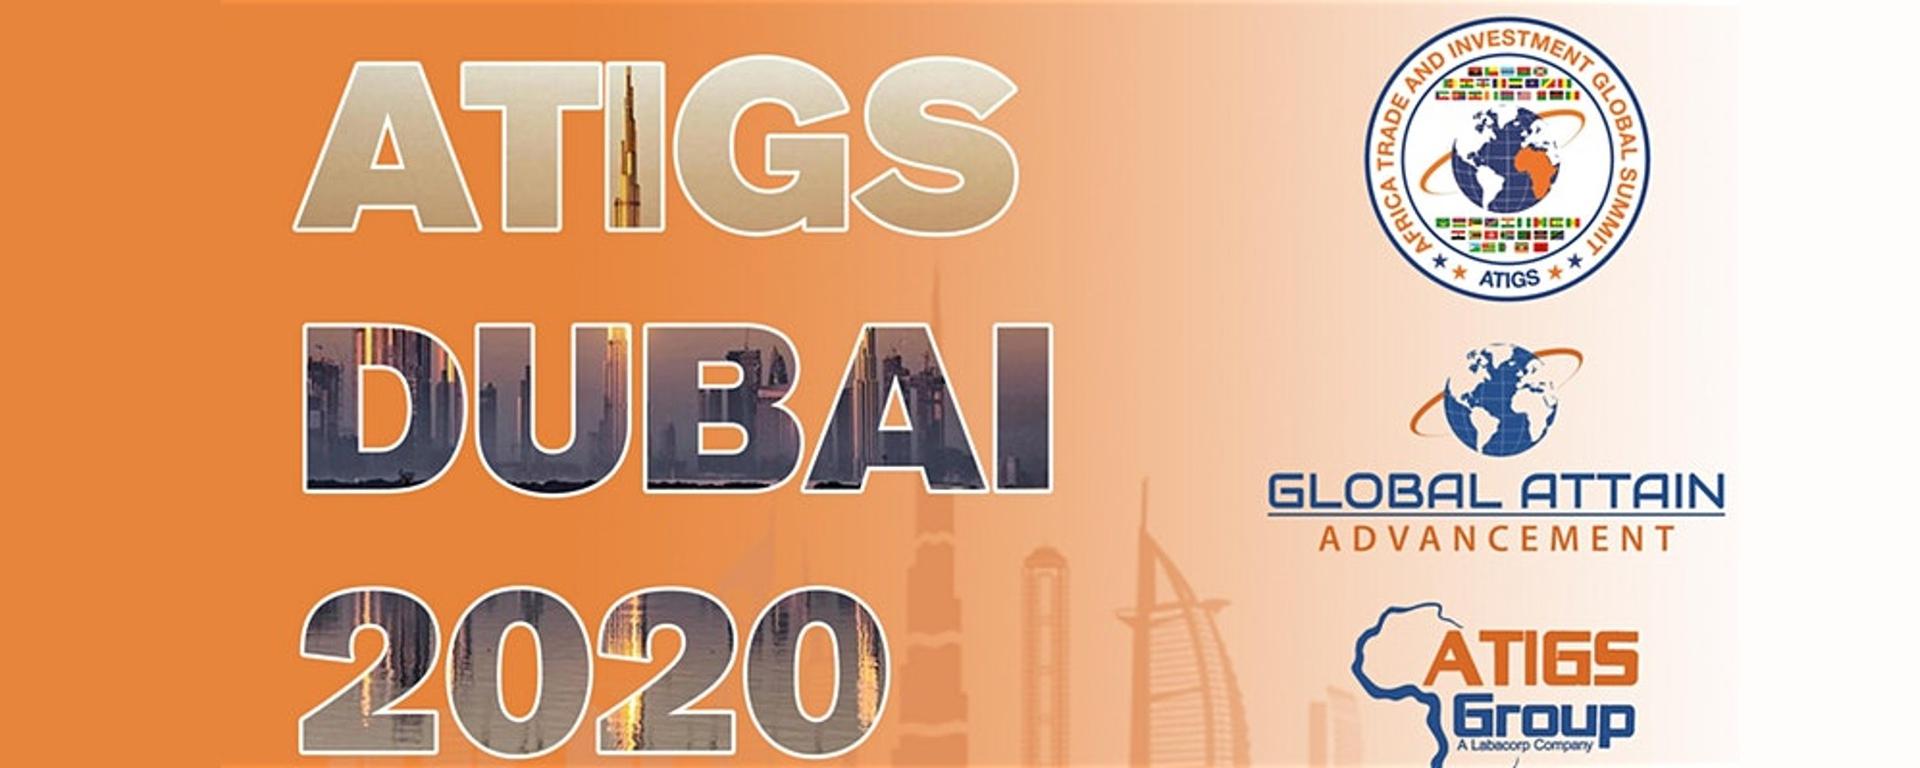 ATIGS Group - ATIGS Dubai 2020 Movemeback African event cover image